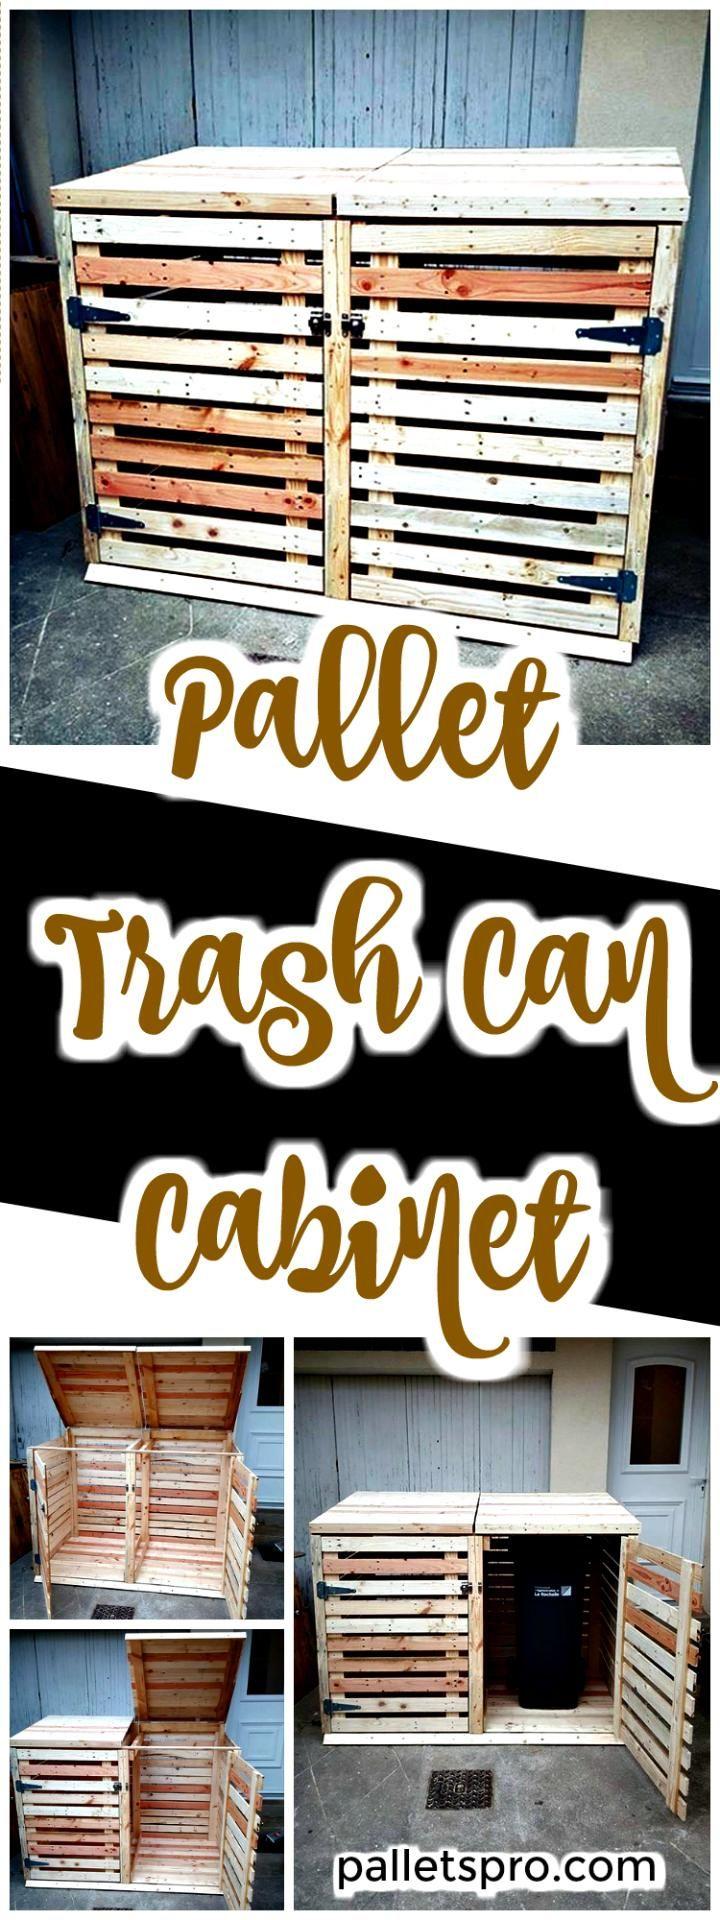 Pallet Trash Can Cabinet - Pallets Pro